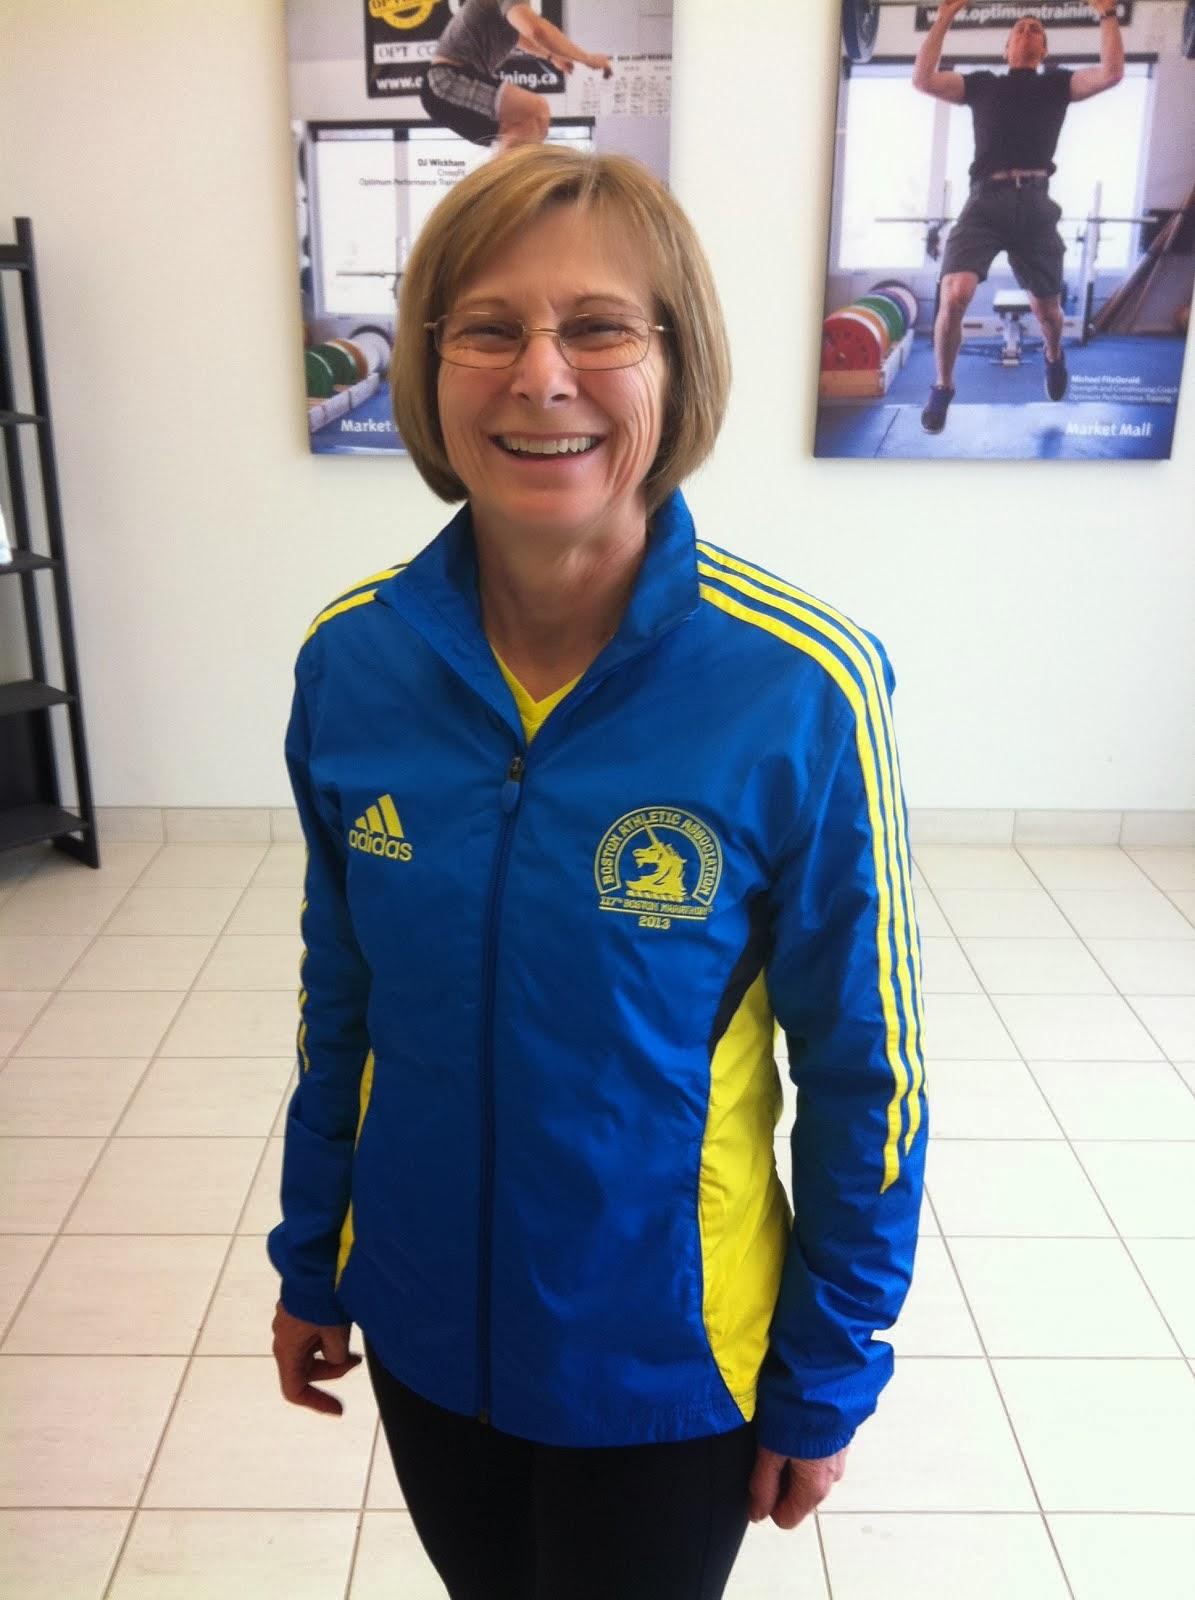 Shelagh - Marathon Runner